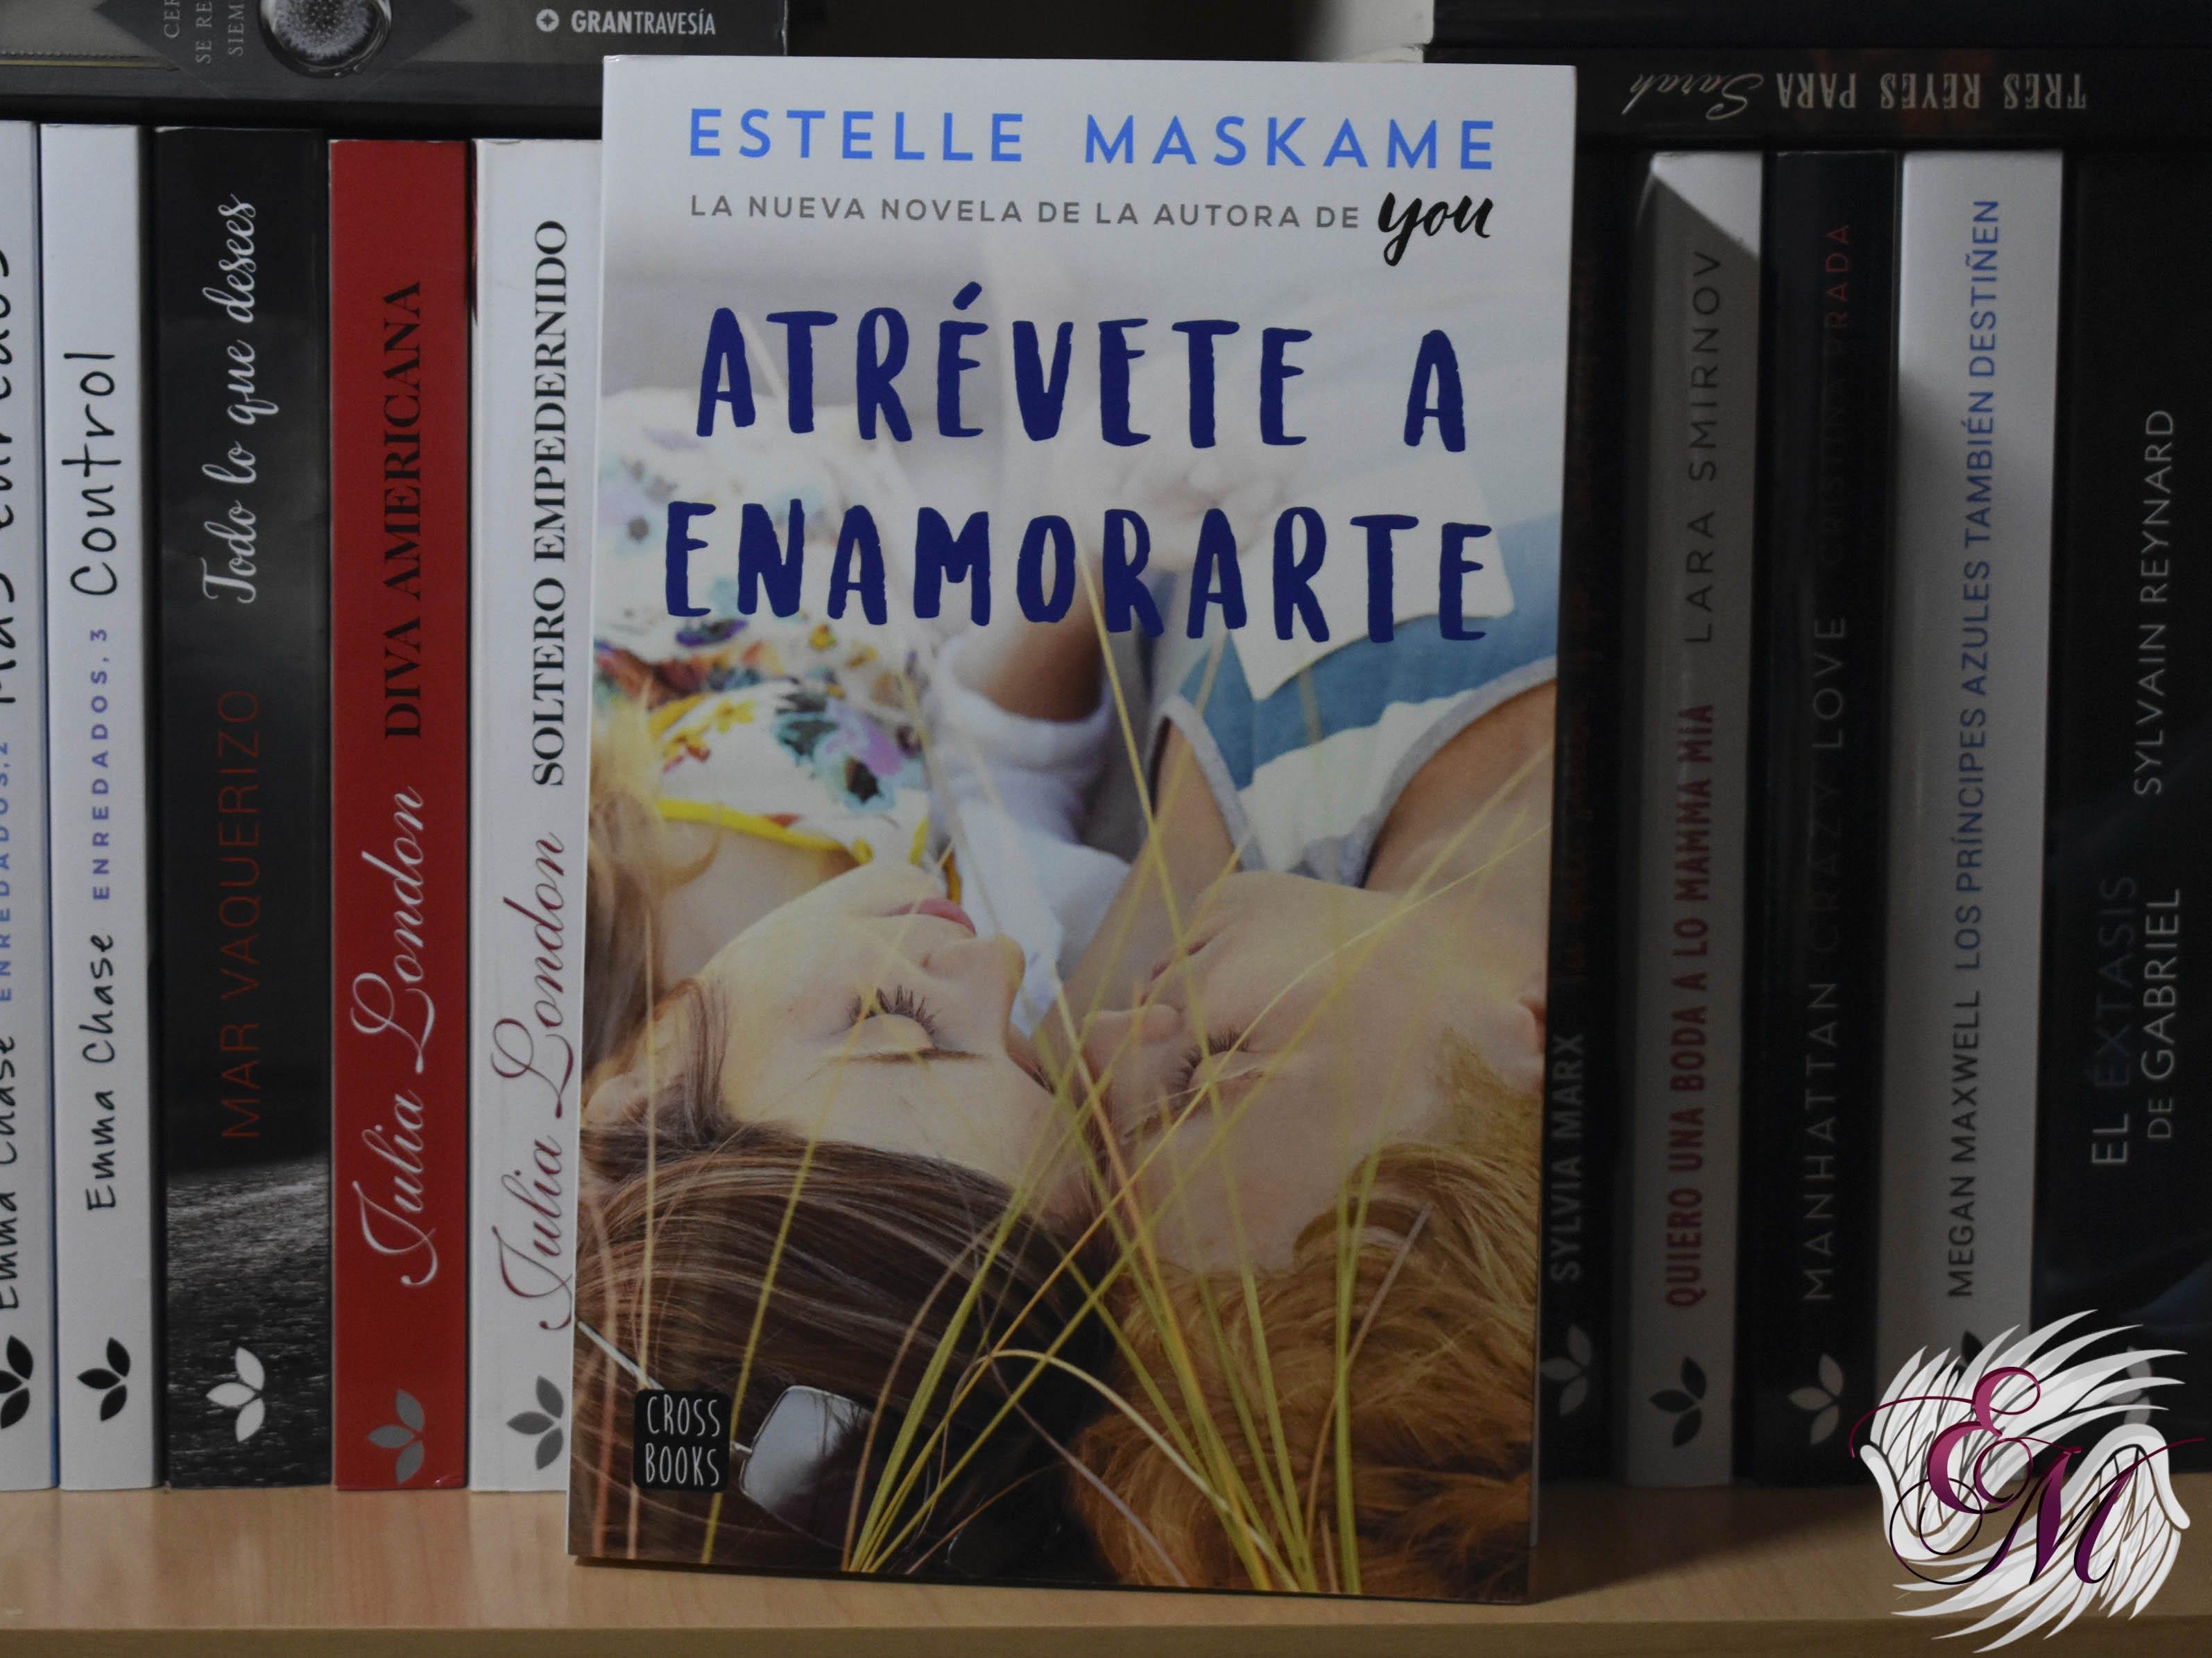 Atrévete a enamorarte, de Estelle Maskame - Reseña